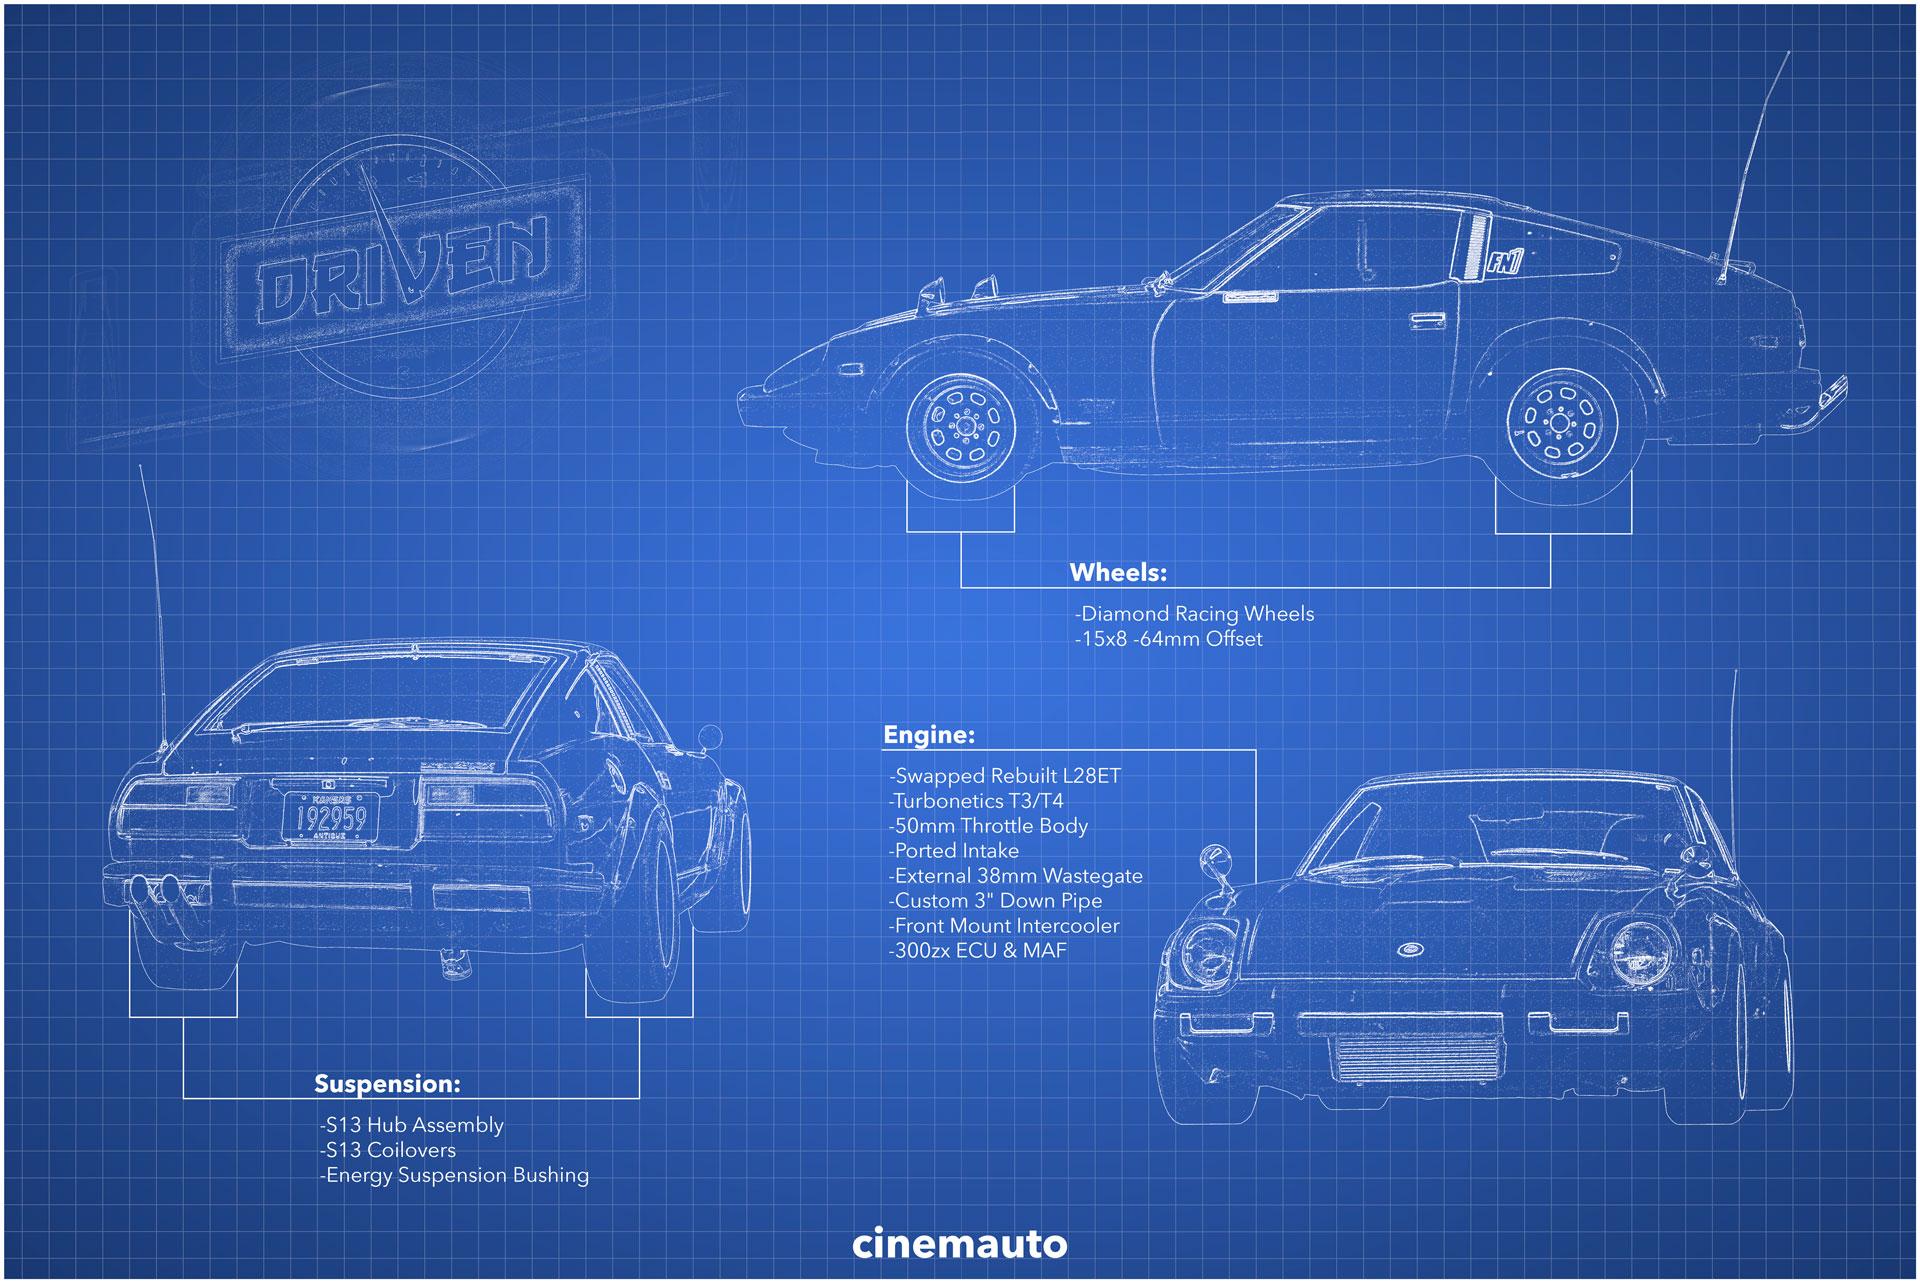 cinemauto-blueprint-luis-sm2.jpg